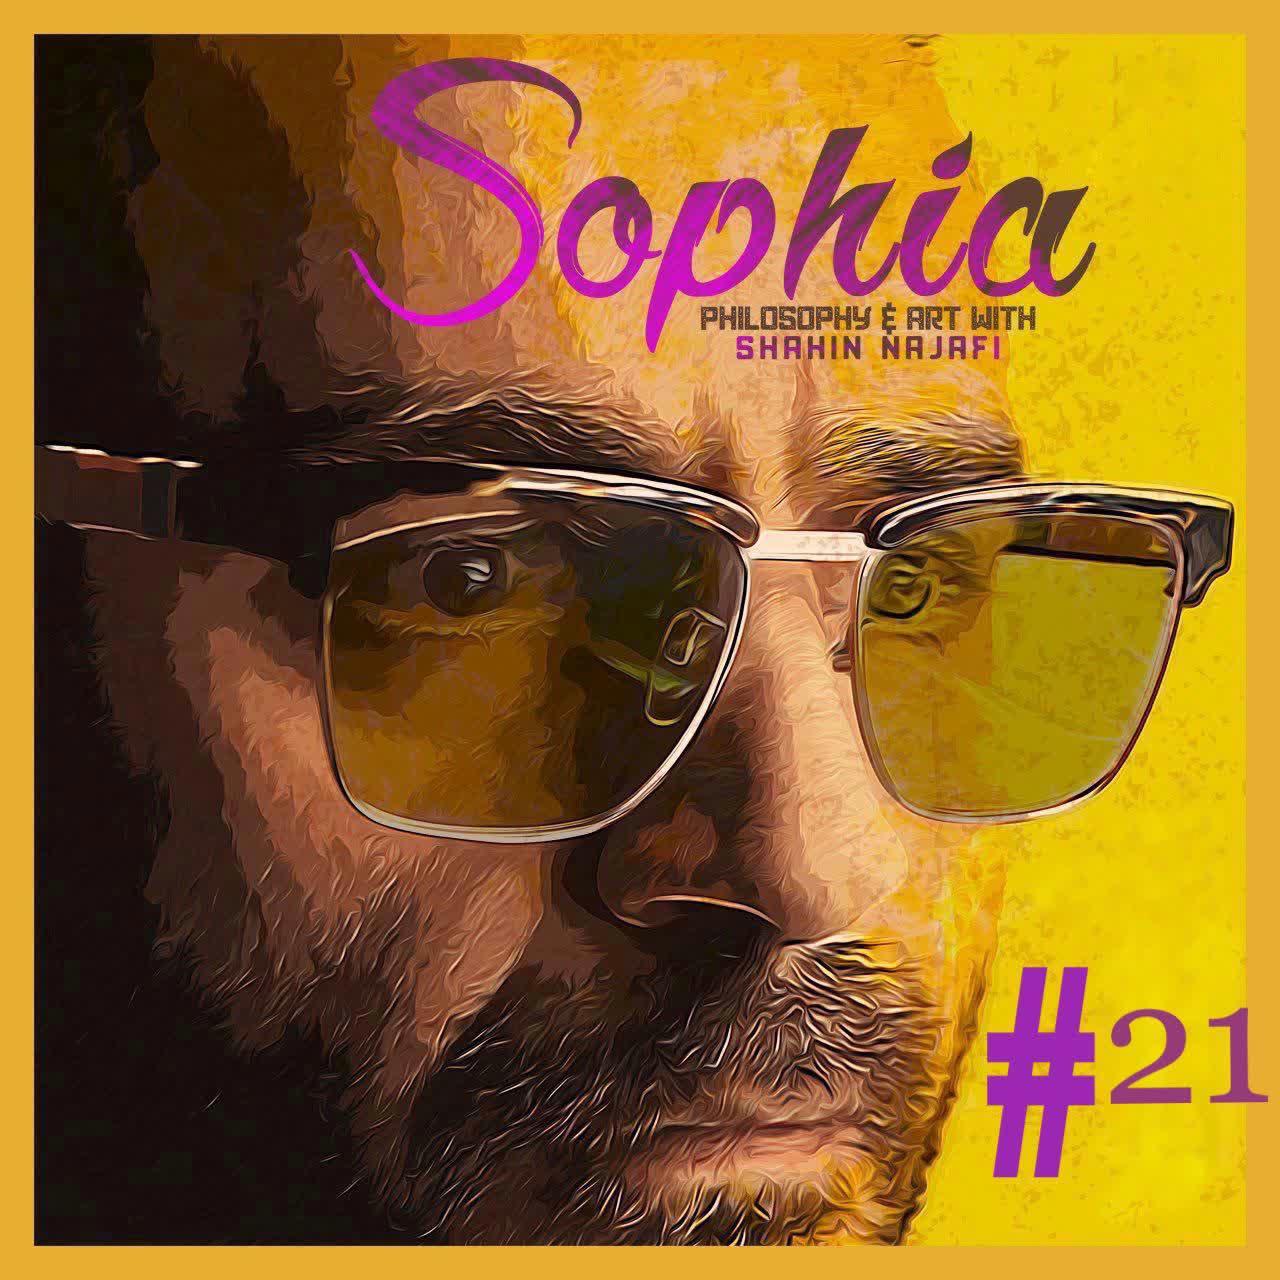 Sophia #21 Aristotle 1- Shahin Najafi & Veria Amiri سوفیا ۲۱ - ارسطو ۱ - شاهین نجفی و وریا امیری